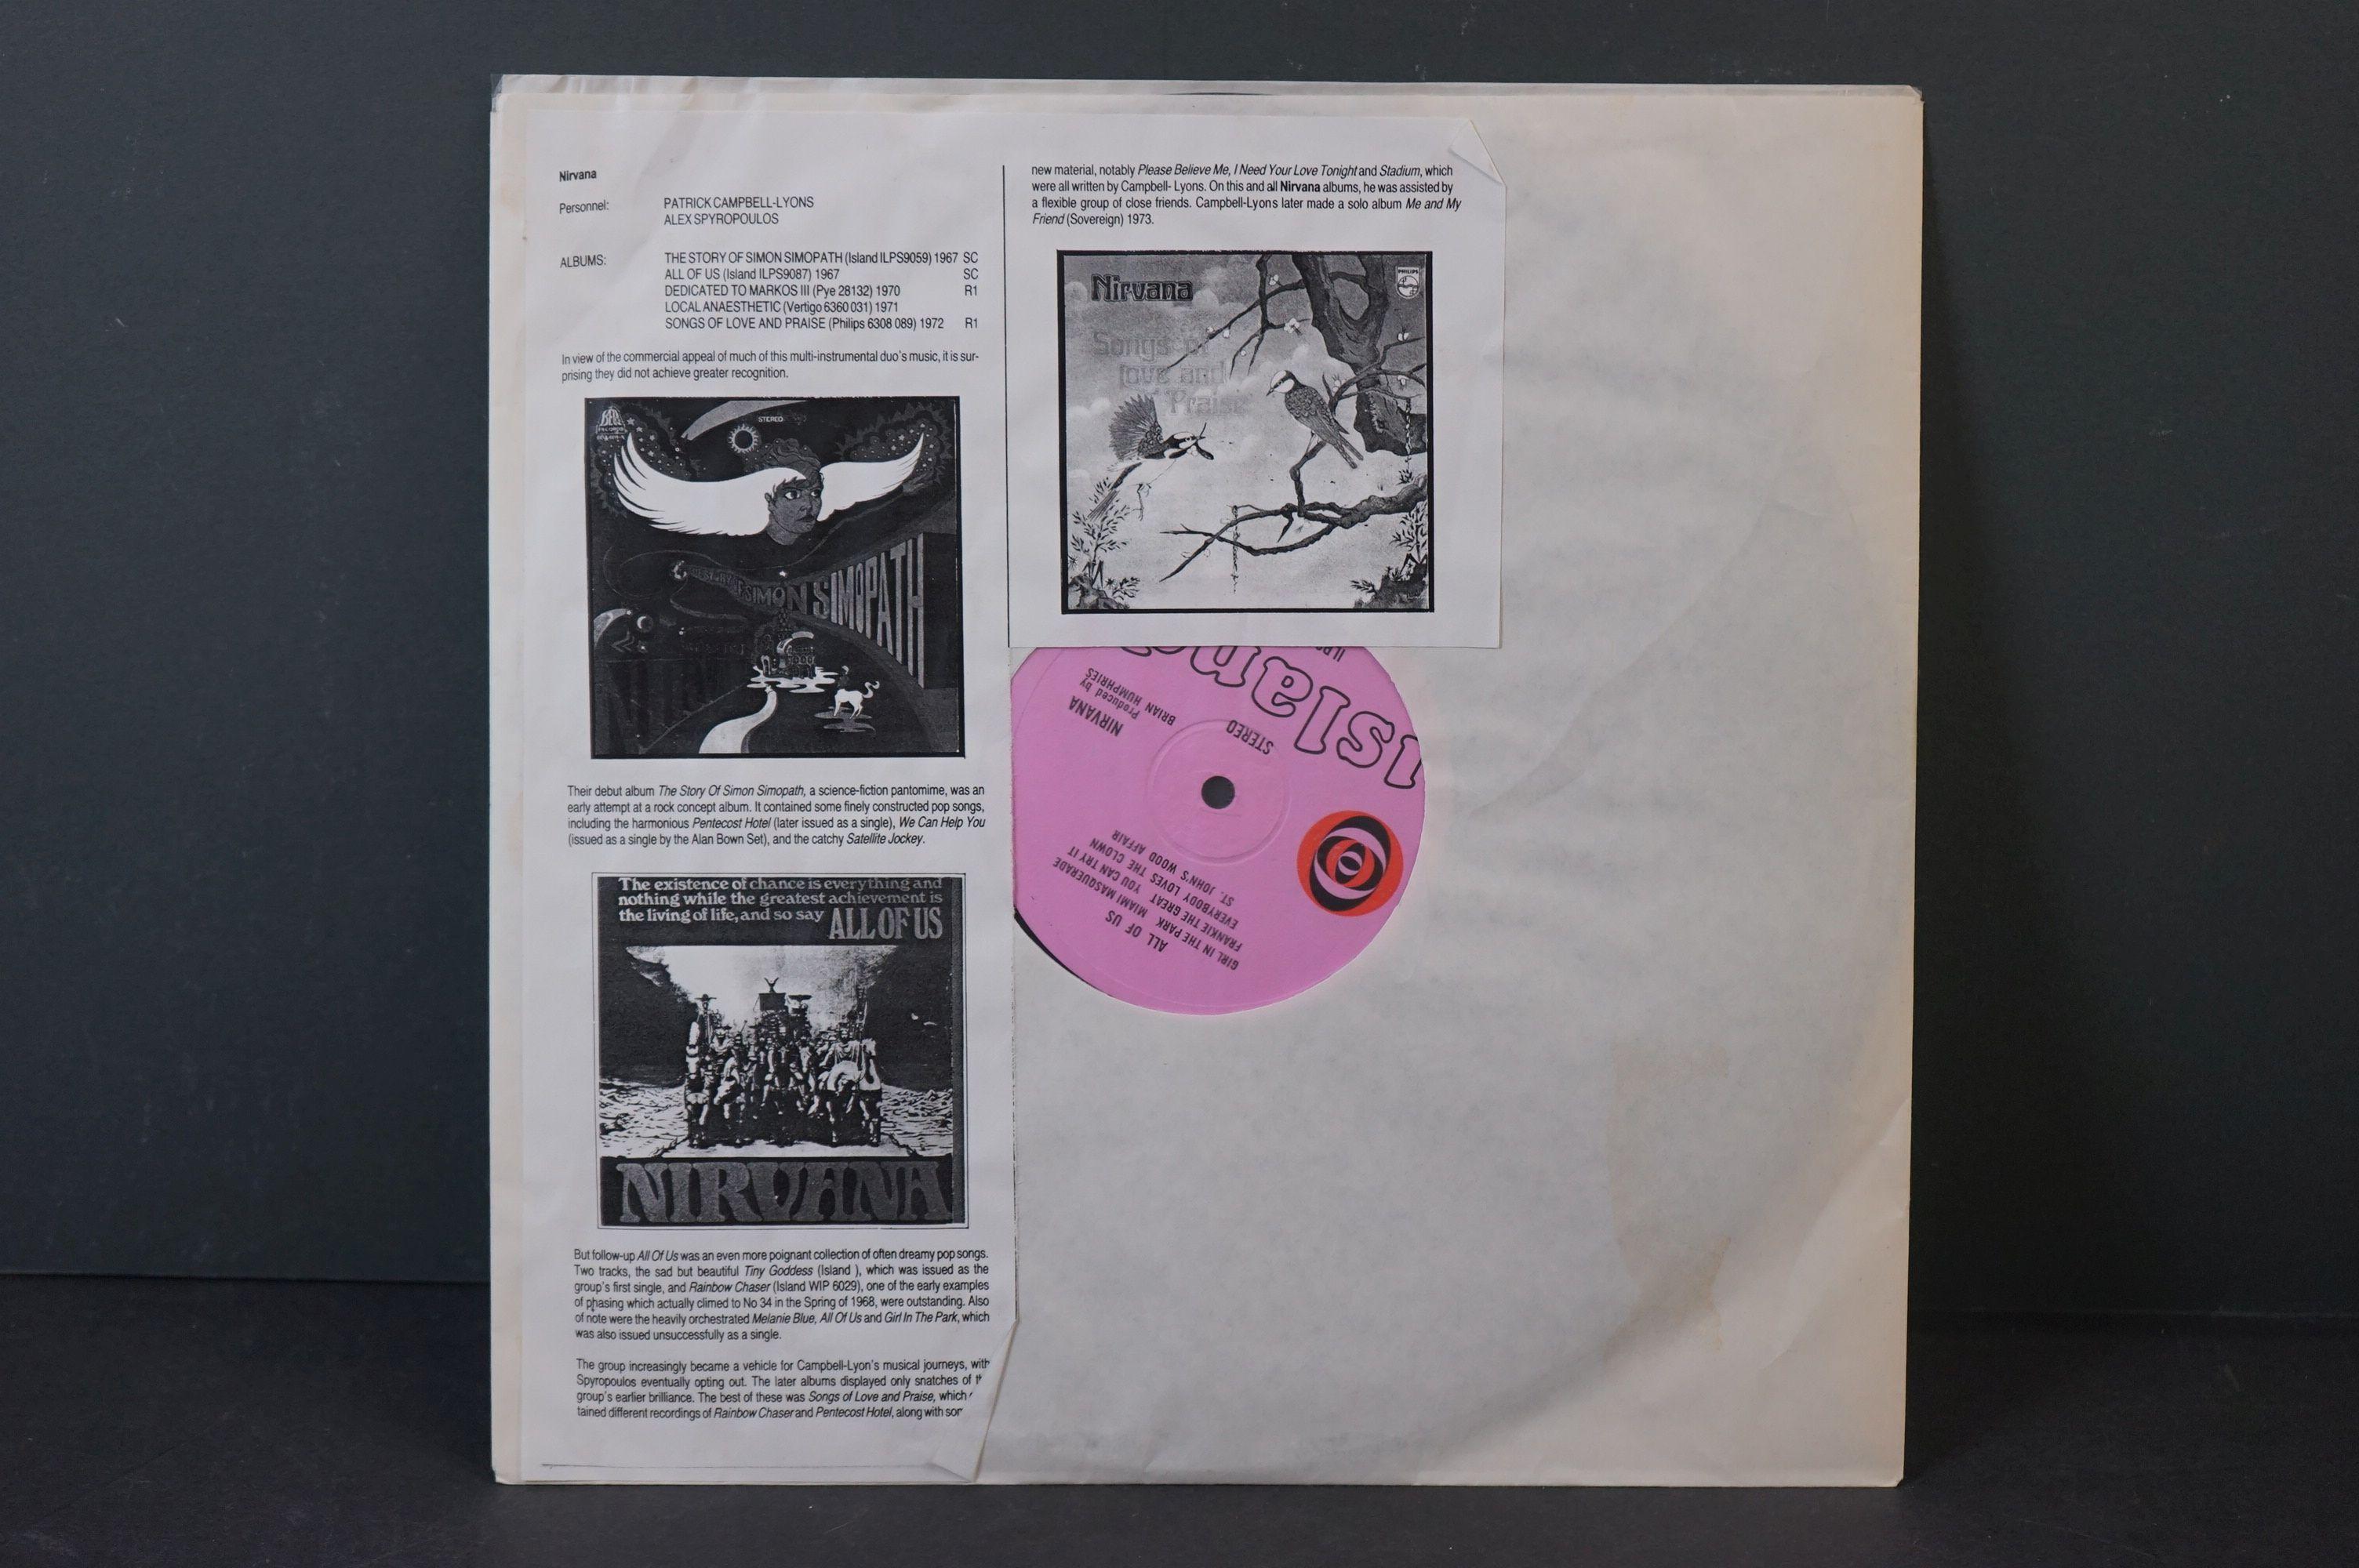 Vinyl - Nirvana All Of Us LP on Island ILPS 9087 with pink label, orange/black circle logo, - Image 6 of 6